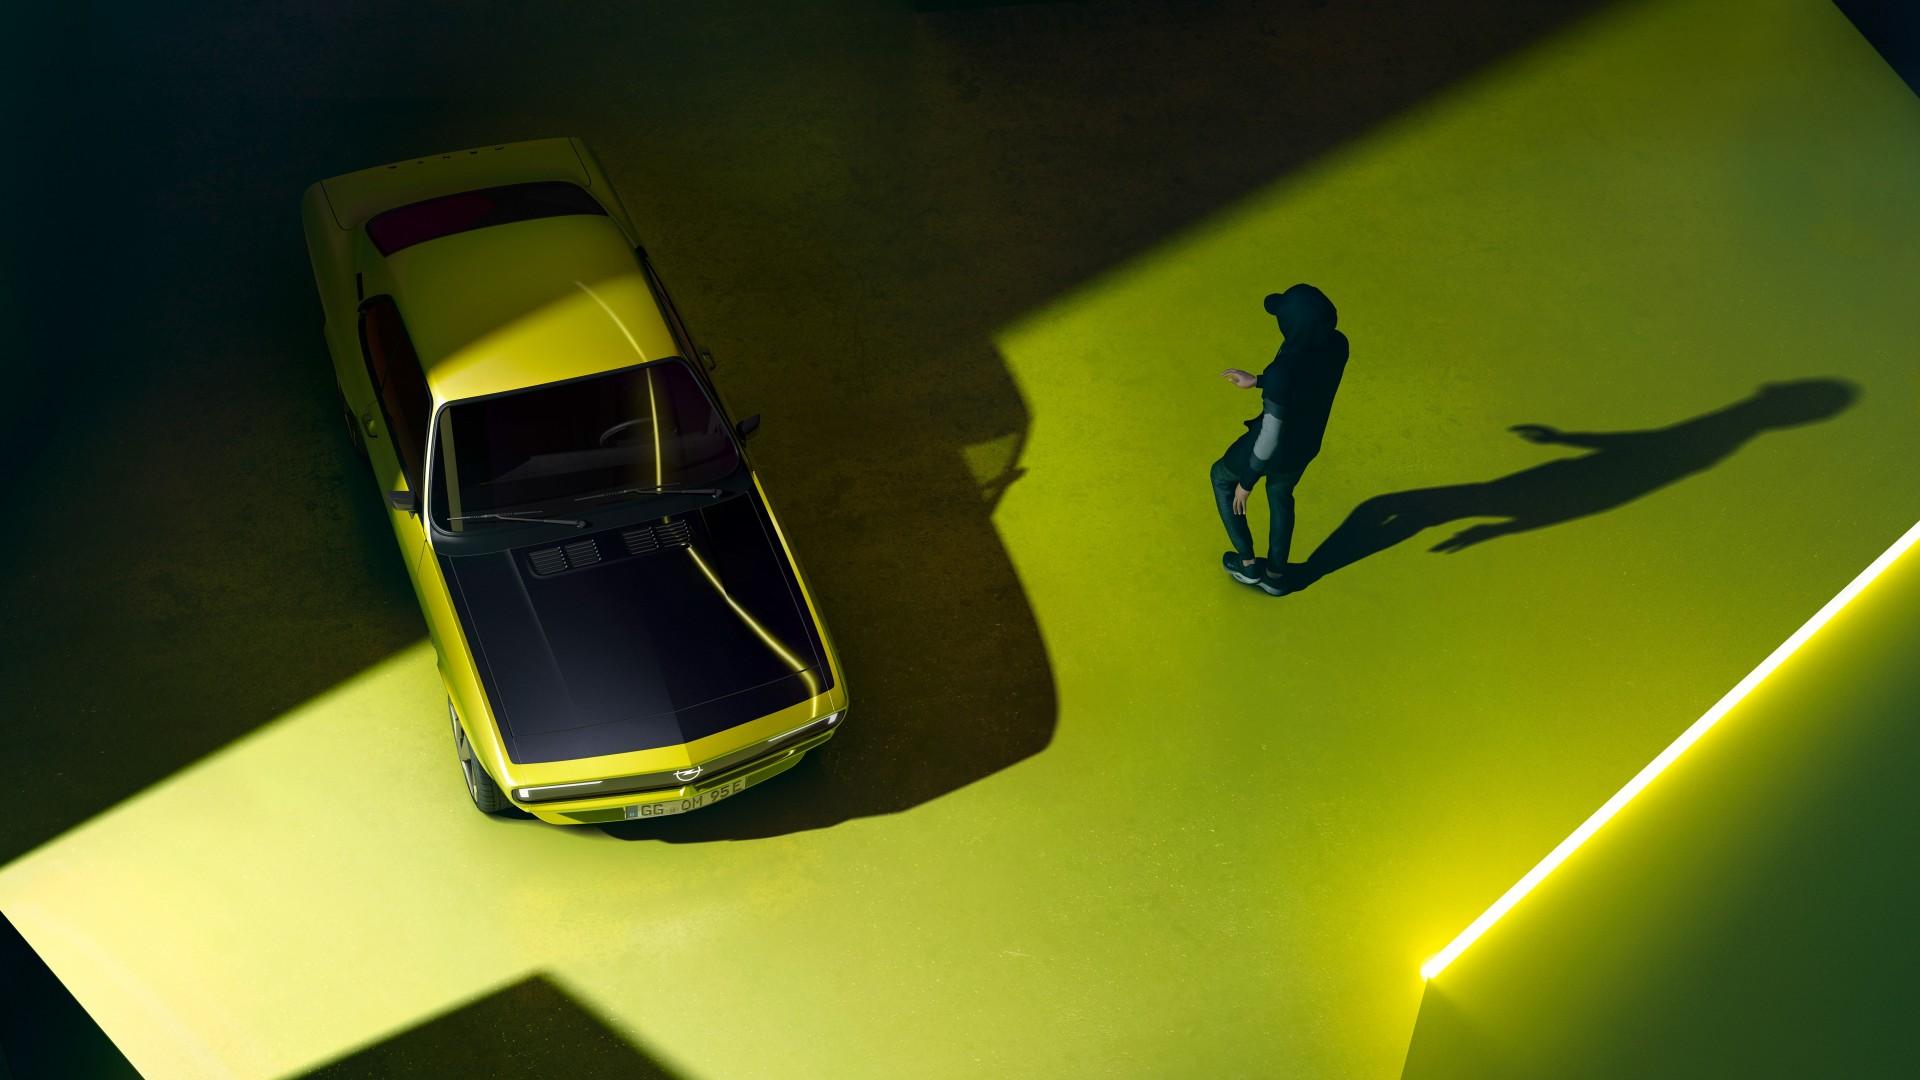 Opel Manta GSe ElektroMOD, presentando el futuro a golpe de nostalgia